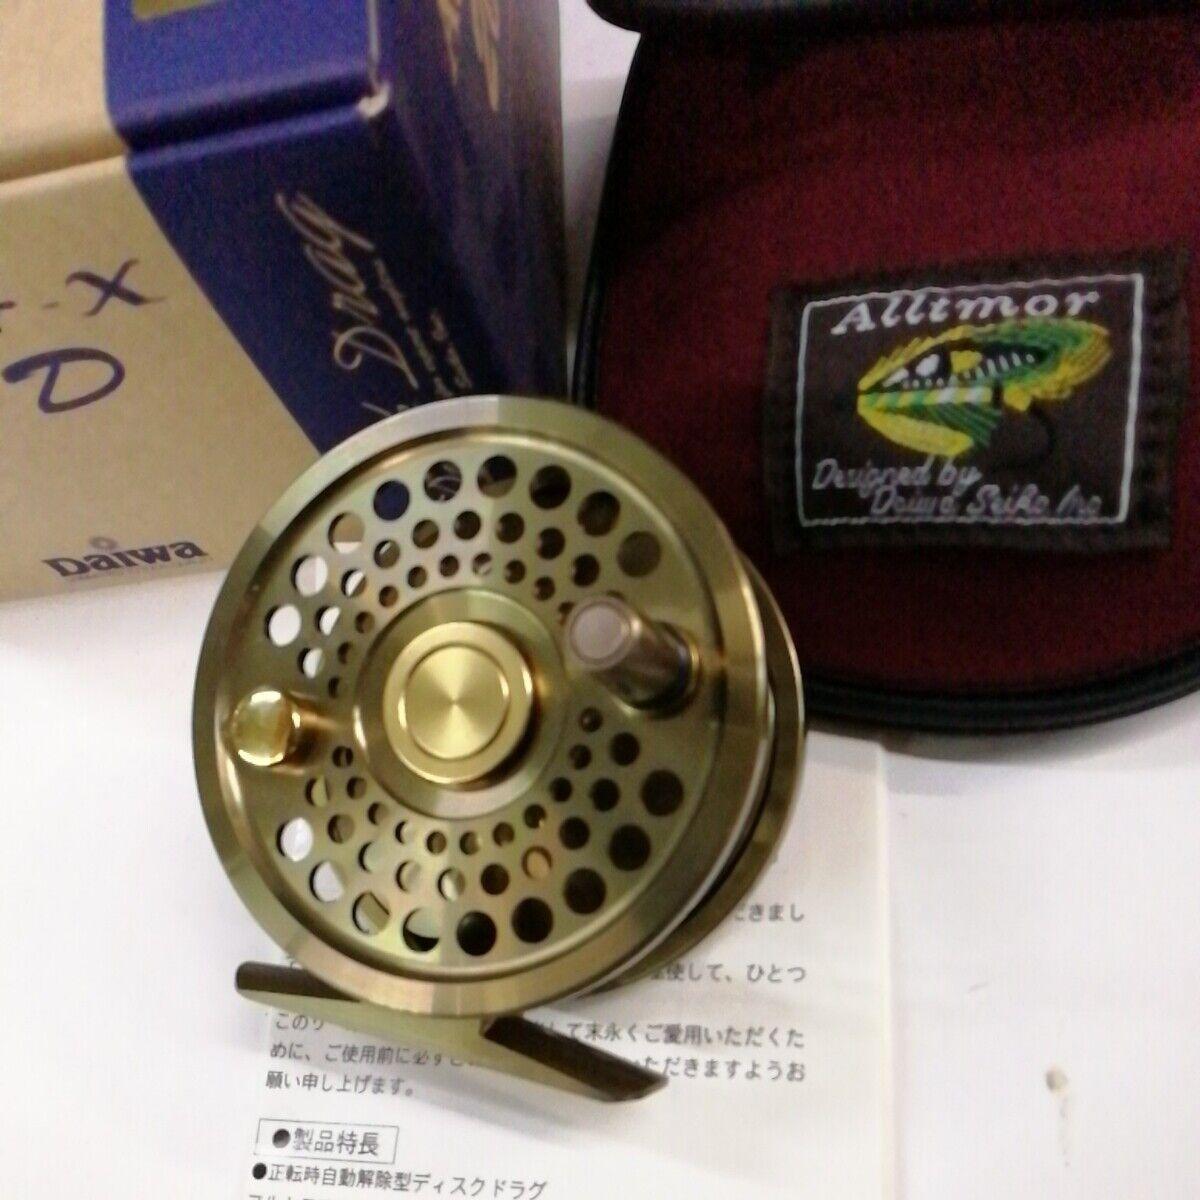 DAIWA Fly Fishing Reel Alltmor X 200D Fishing NEW in BOX F/S